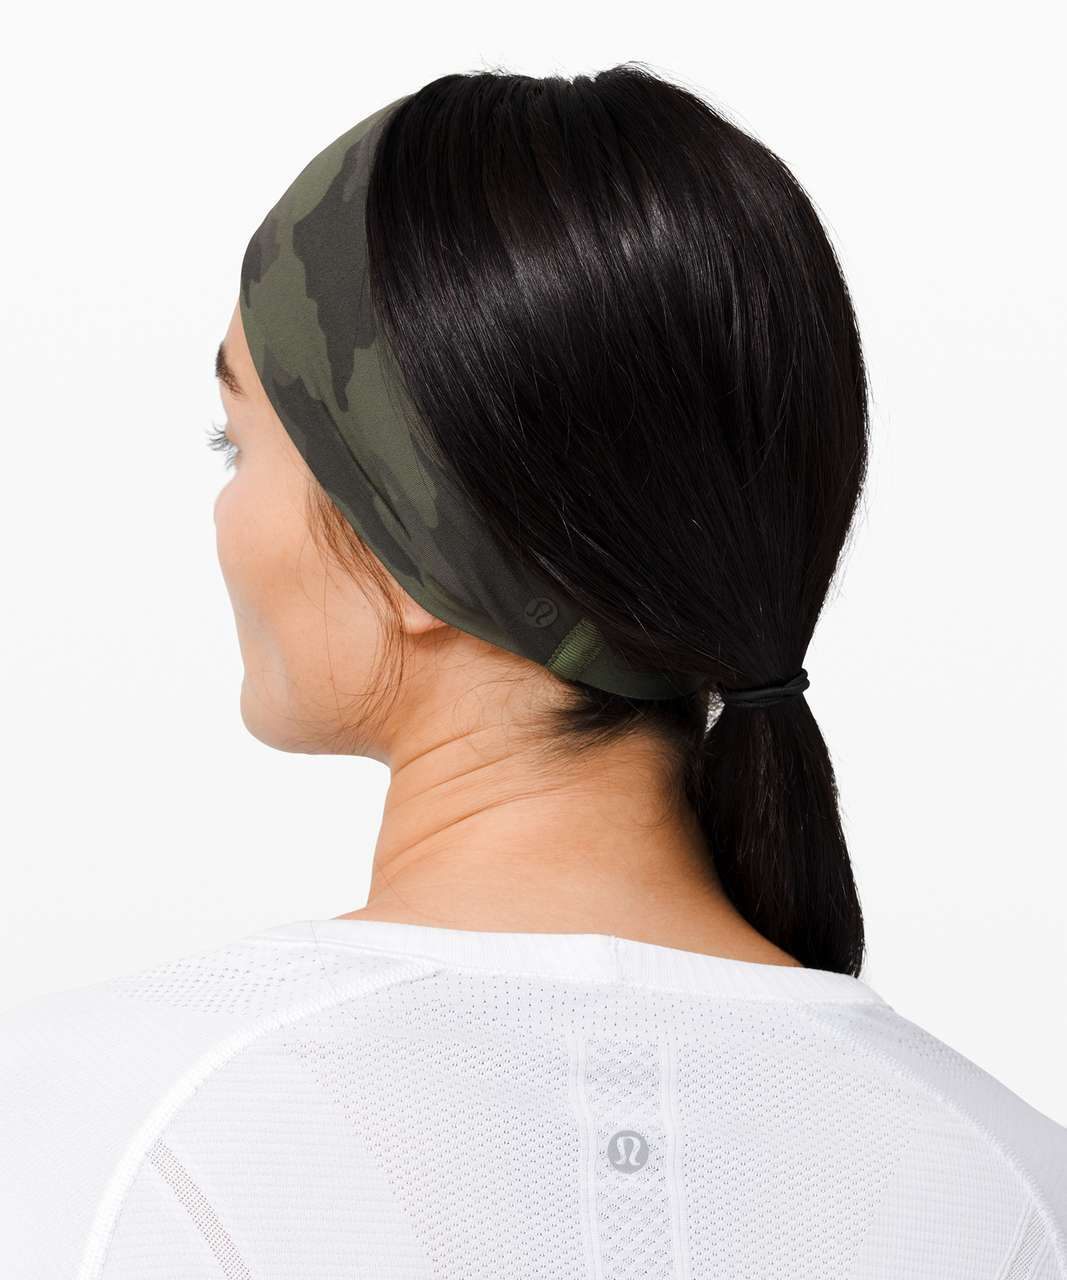 Lululemon Fringe Fighter Headband - Heritage 365 Camo Green Twill Multi